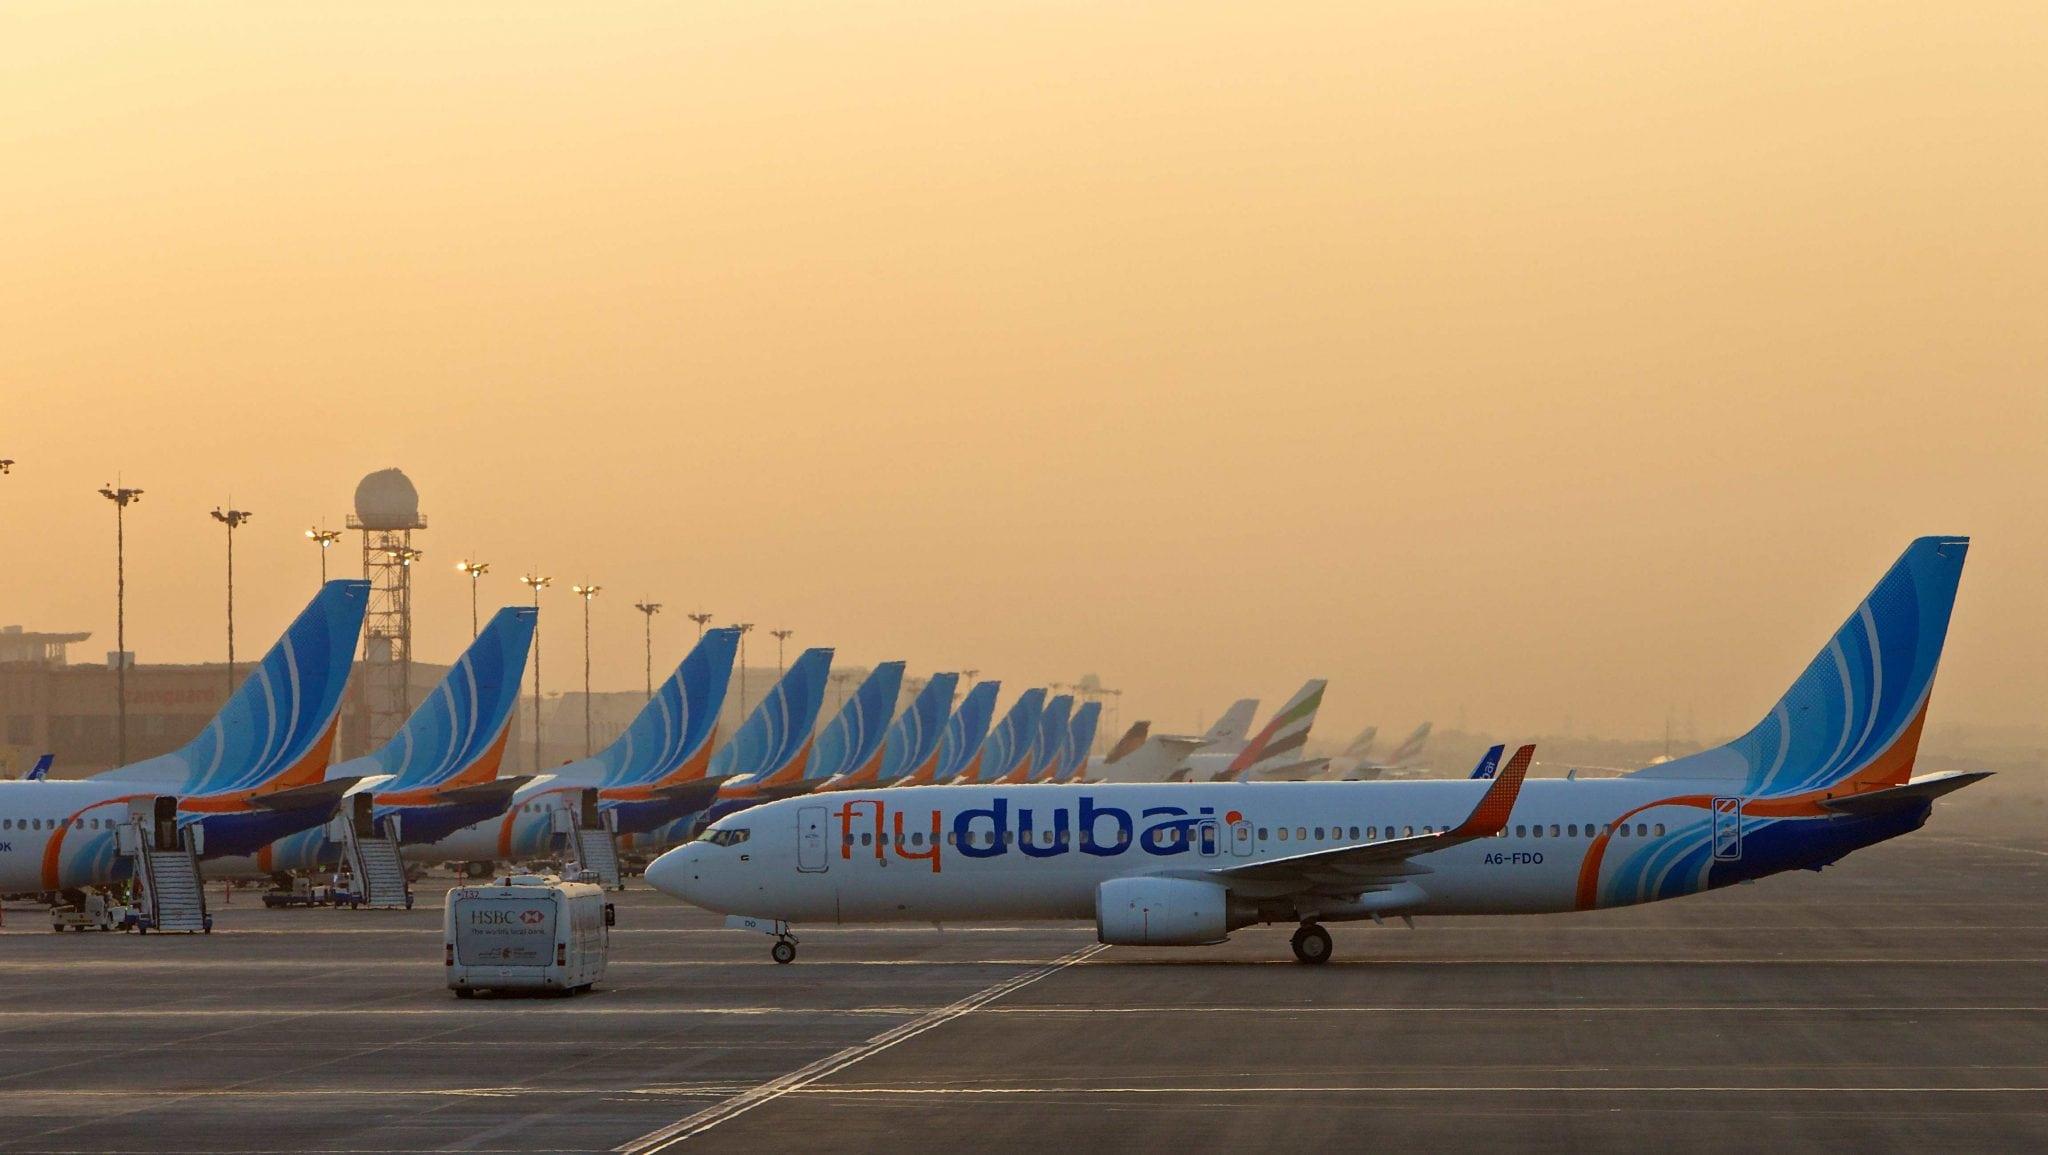 flydubai aircraft on runway